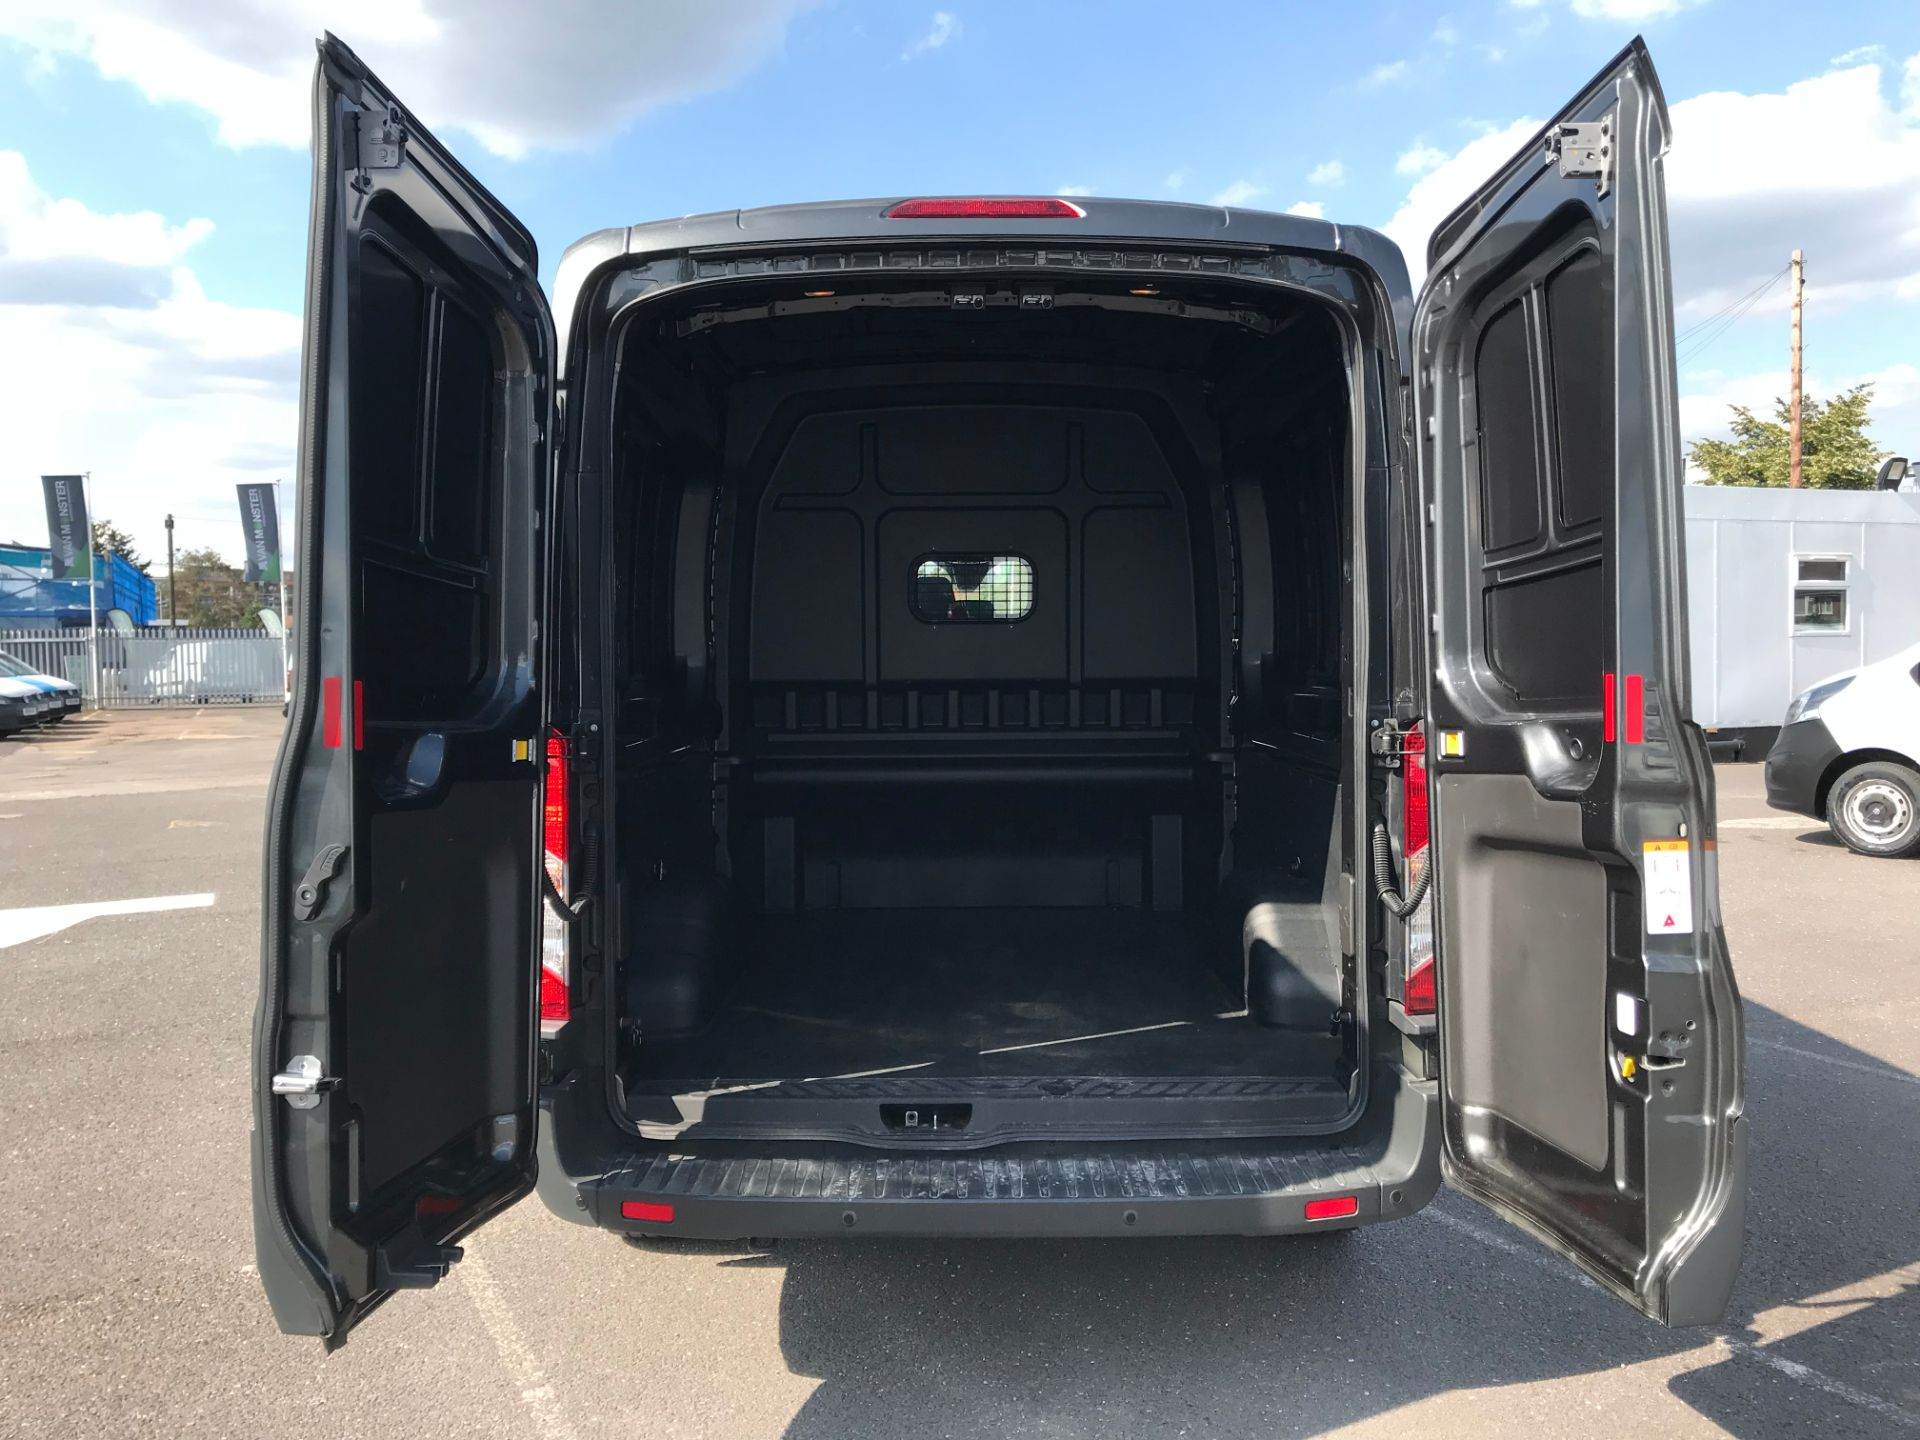 2018 Ford Transit 2.0 TDCi 130ps H2 D/Cab Trend Van Auto (WP68WHL) Image 12